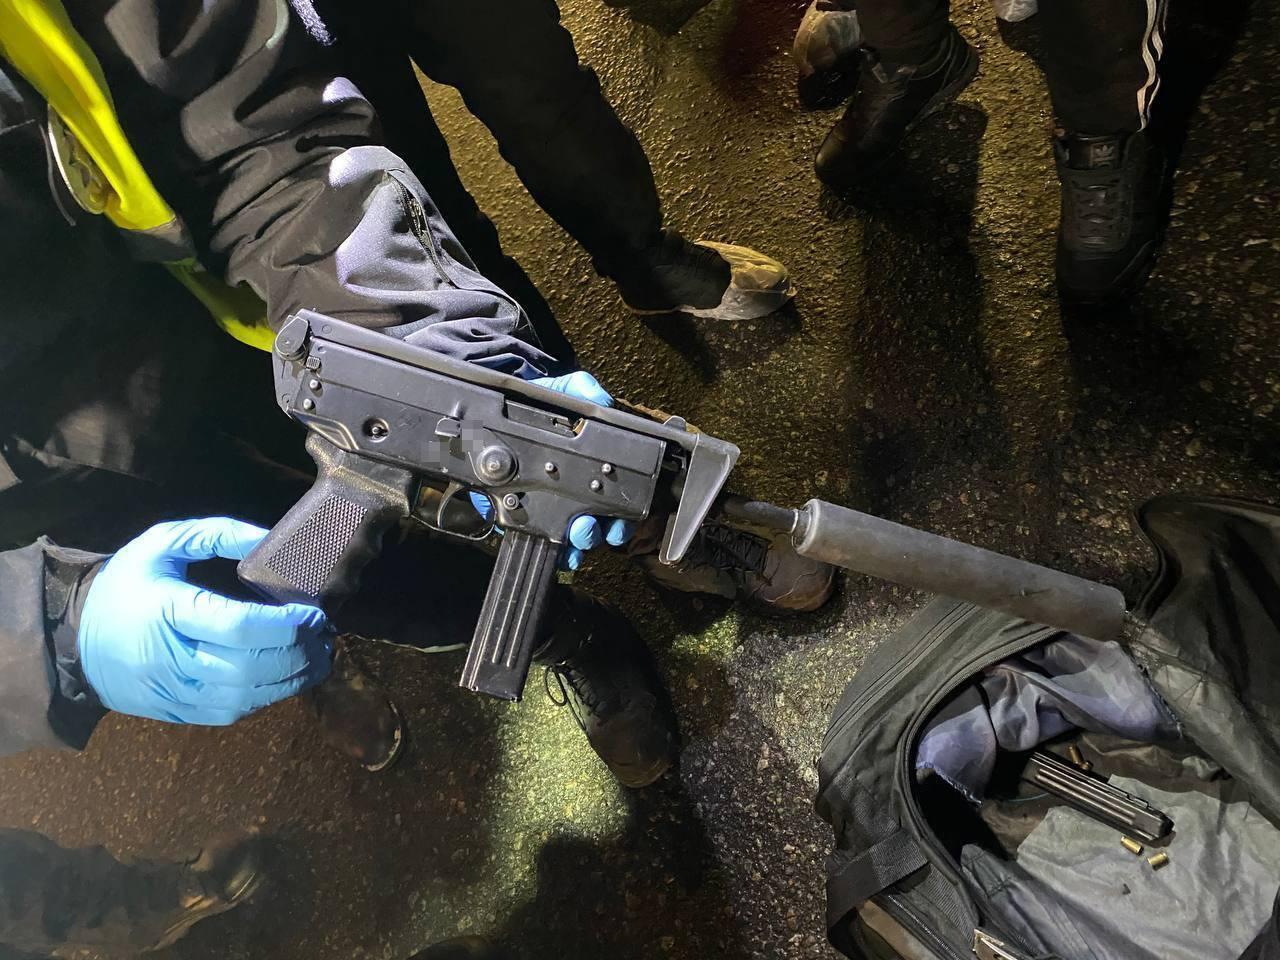 Полицейские изъяли автоматическое оружие